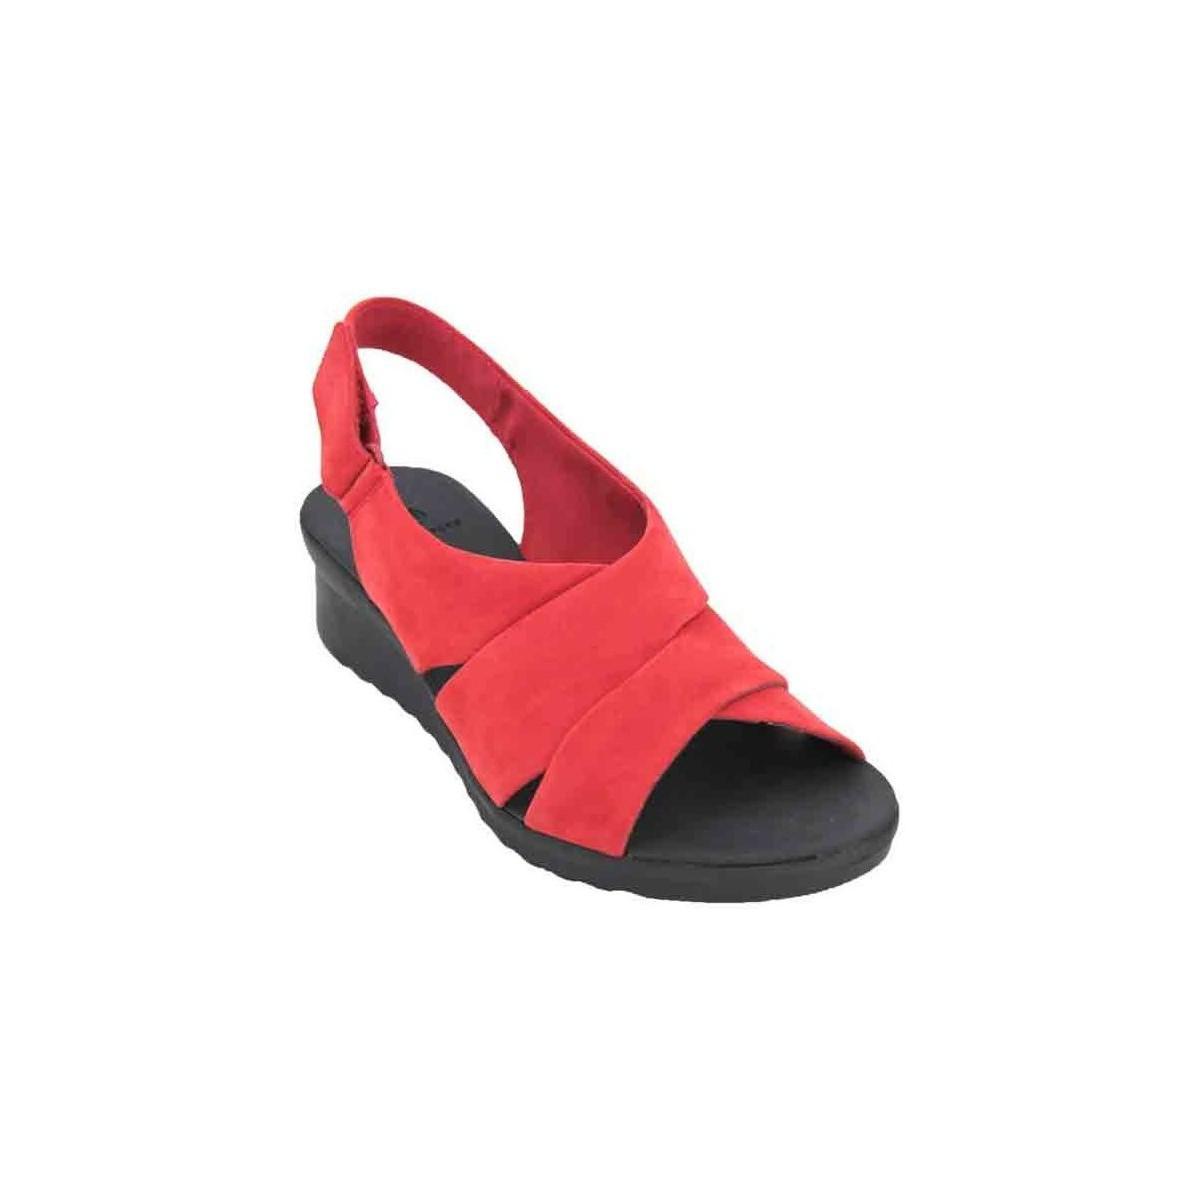 c8ff6fdf31d5 Clarks Caddell Petal Women s Sandals Women s Sandals In Red in Red ...